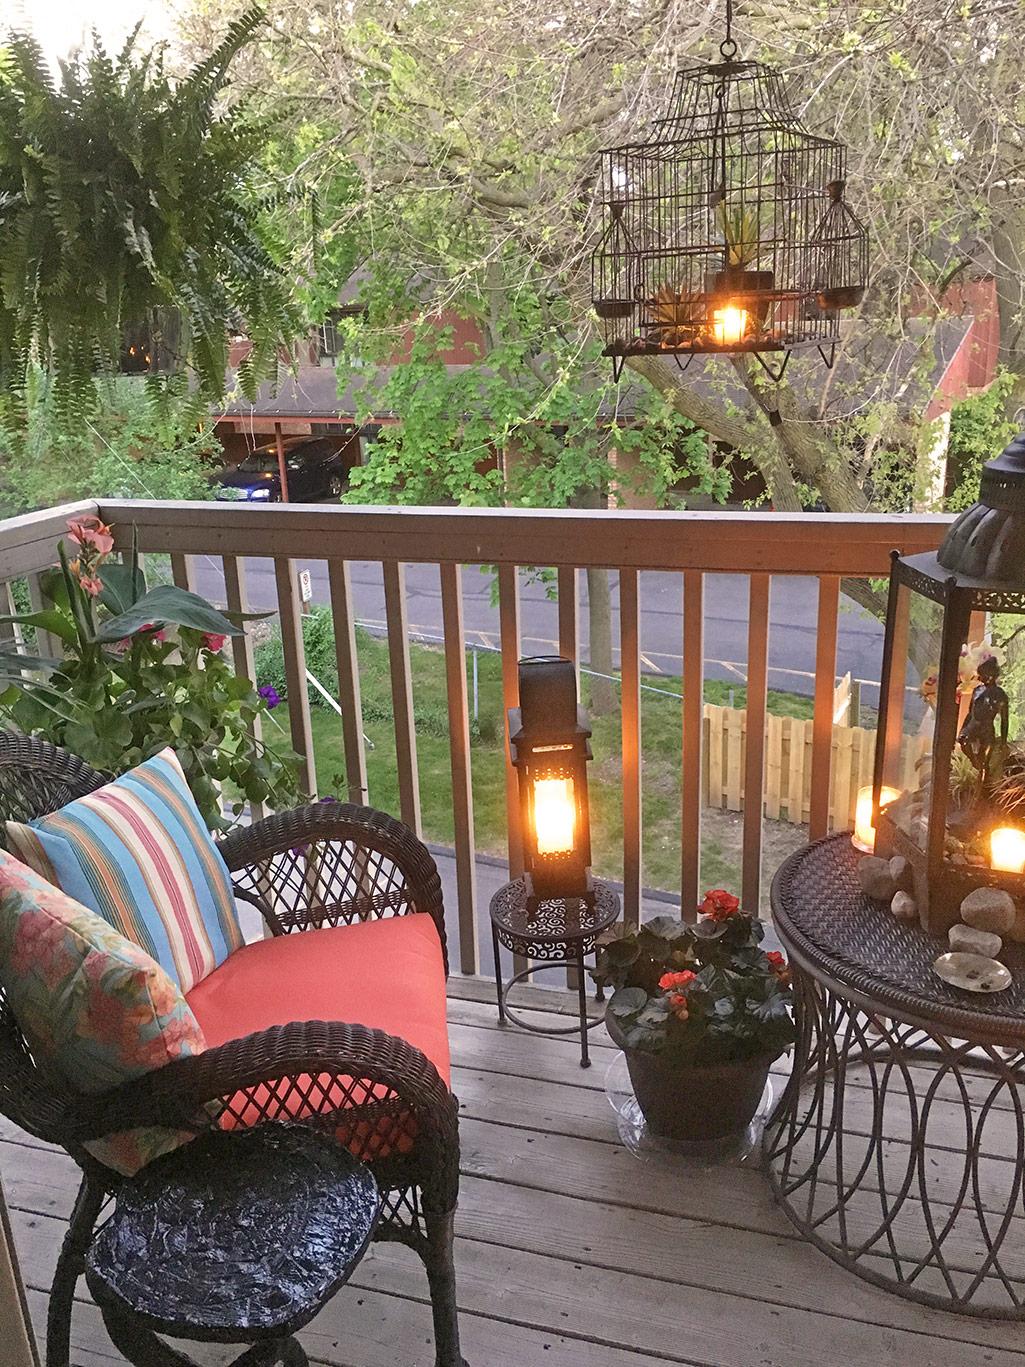 wendy-ryan-interiors-ann-arbor-patio-02.jpg